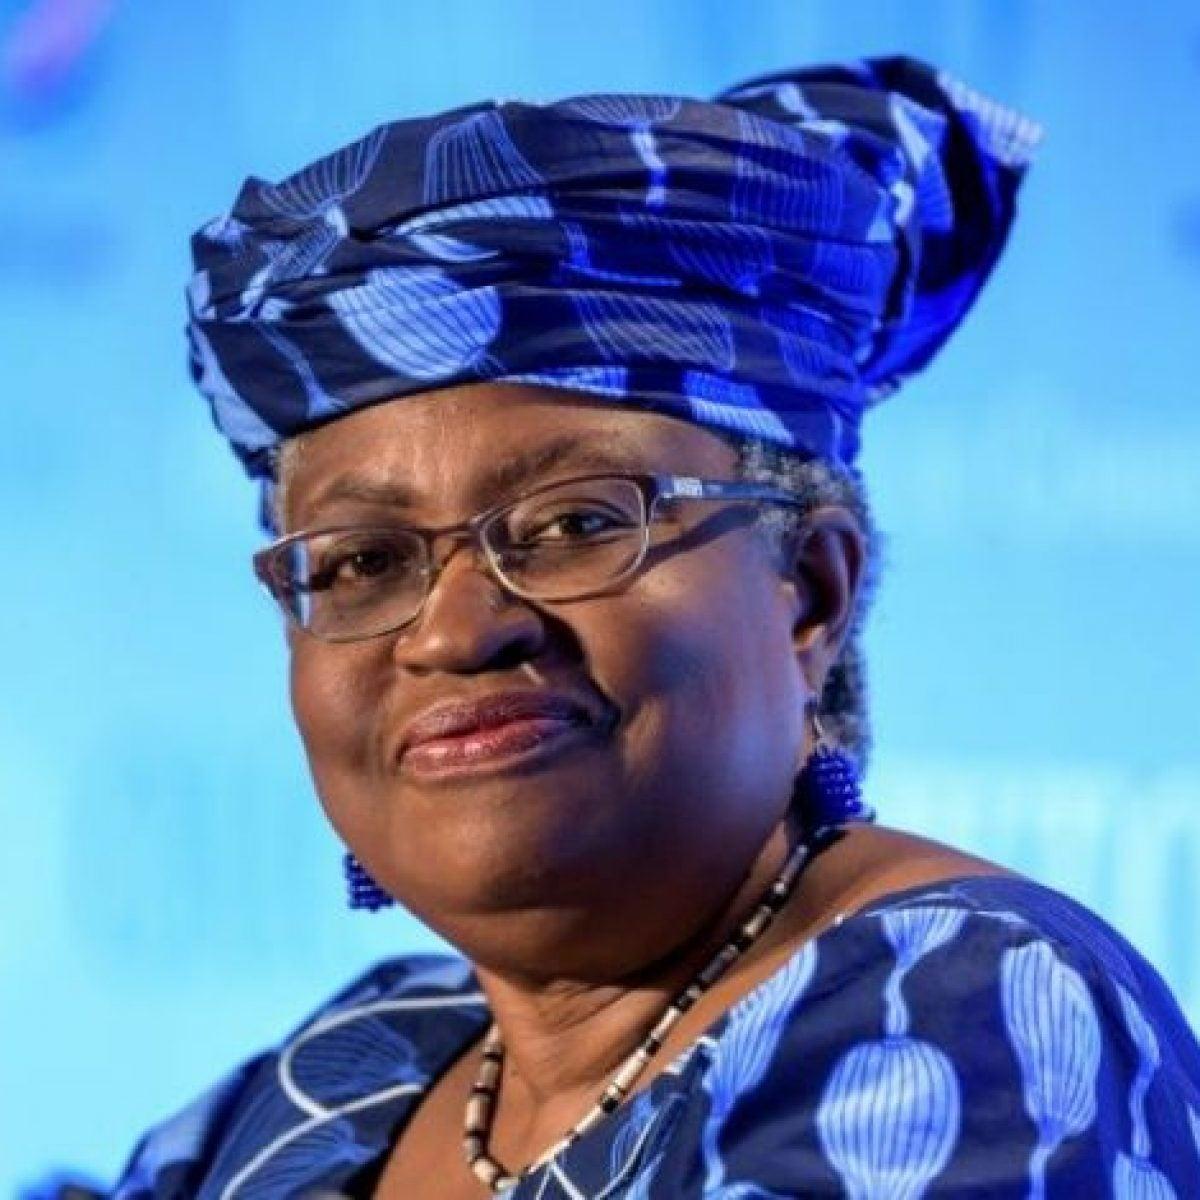 Ngozi Okonjo-Iweala Set To Make History As First Woman To Head The World Trade Organization